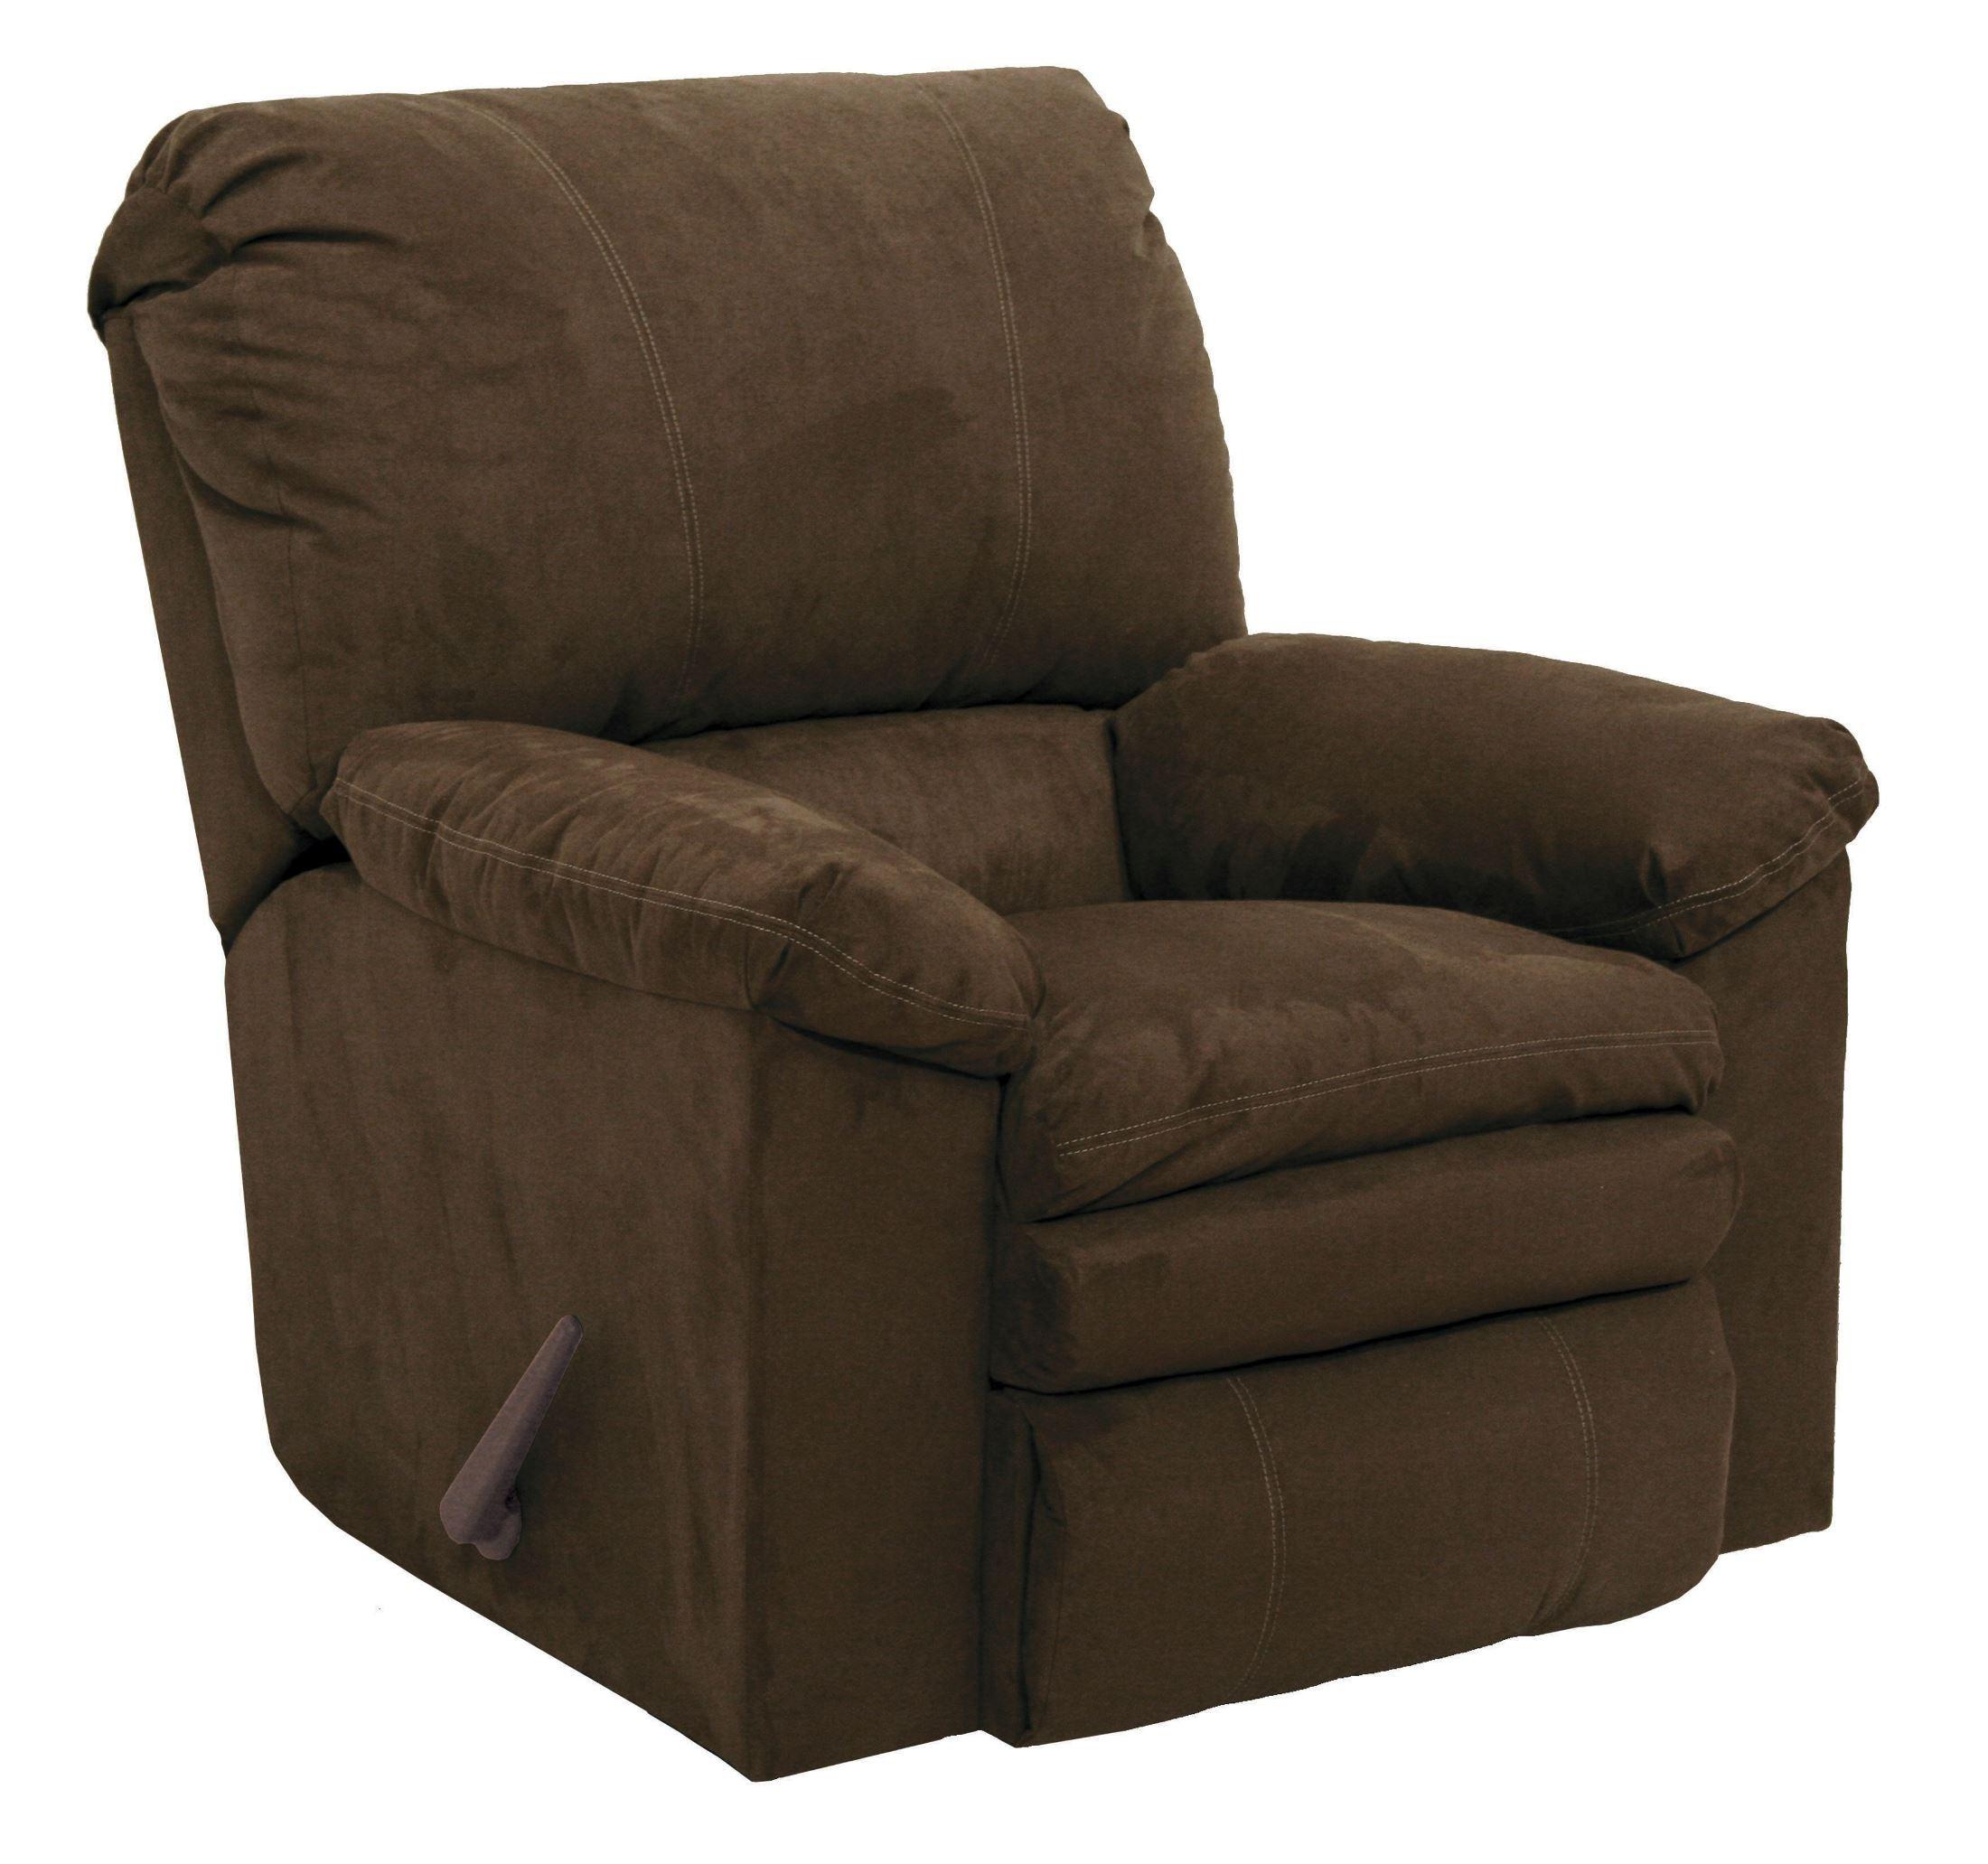 Impulse godiva rocker recliner from catnapper 12402213319 for Catnapper cloud nine chaise recliner